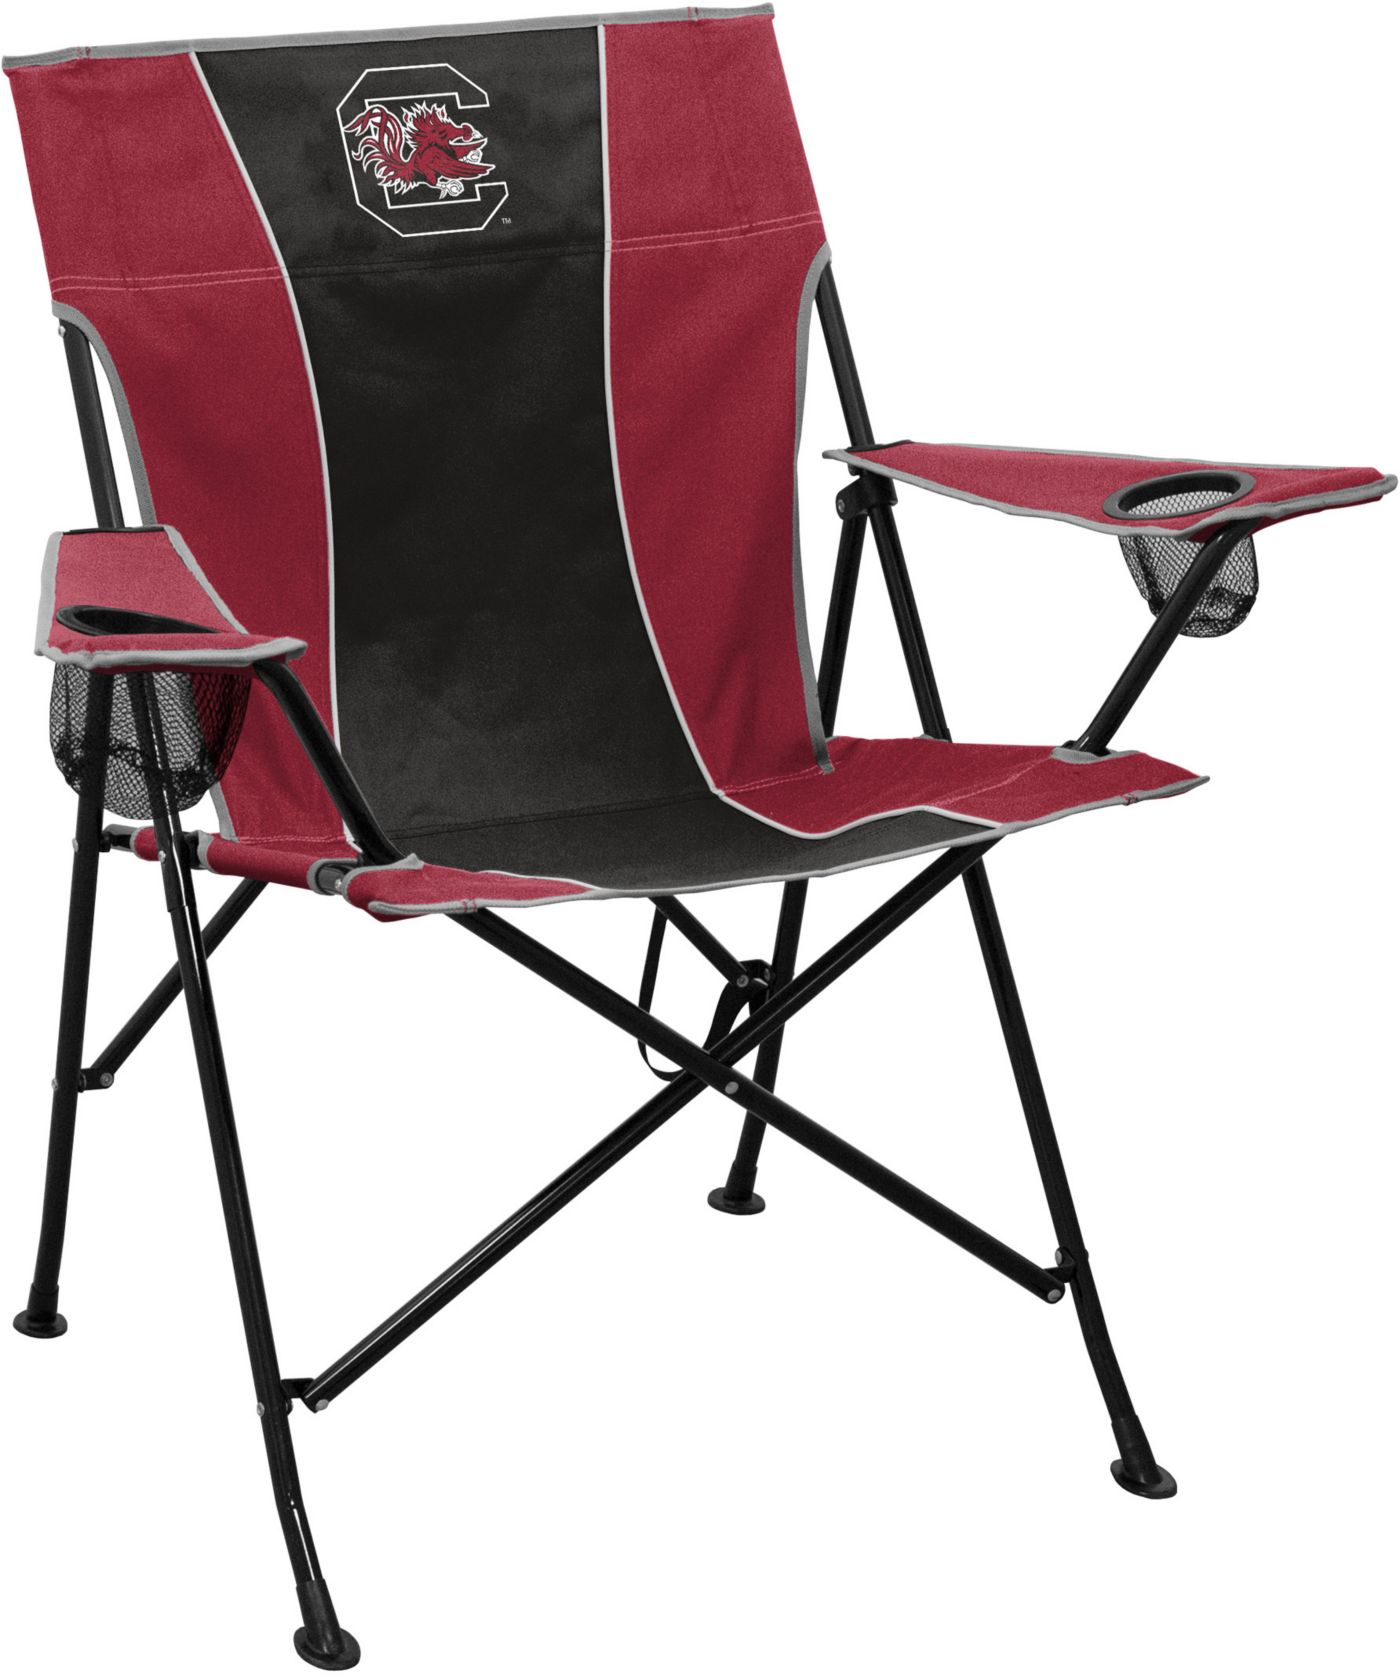 South Carolina Gamecocks Pregame Chair